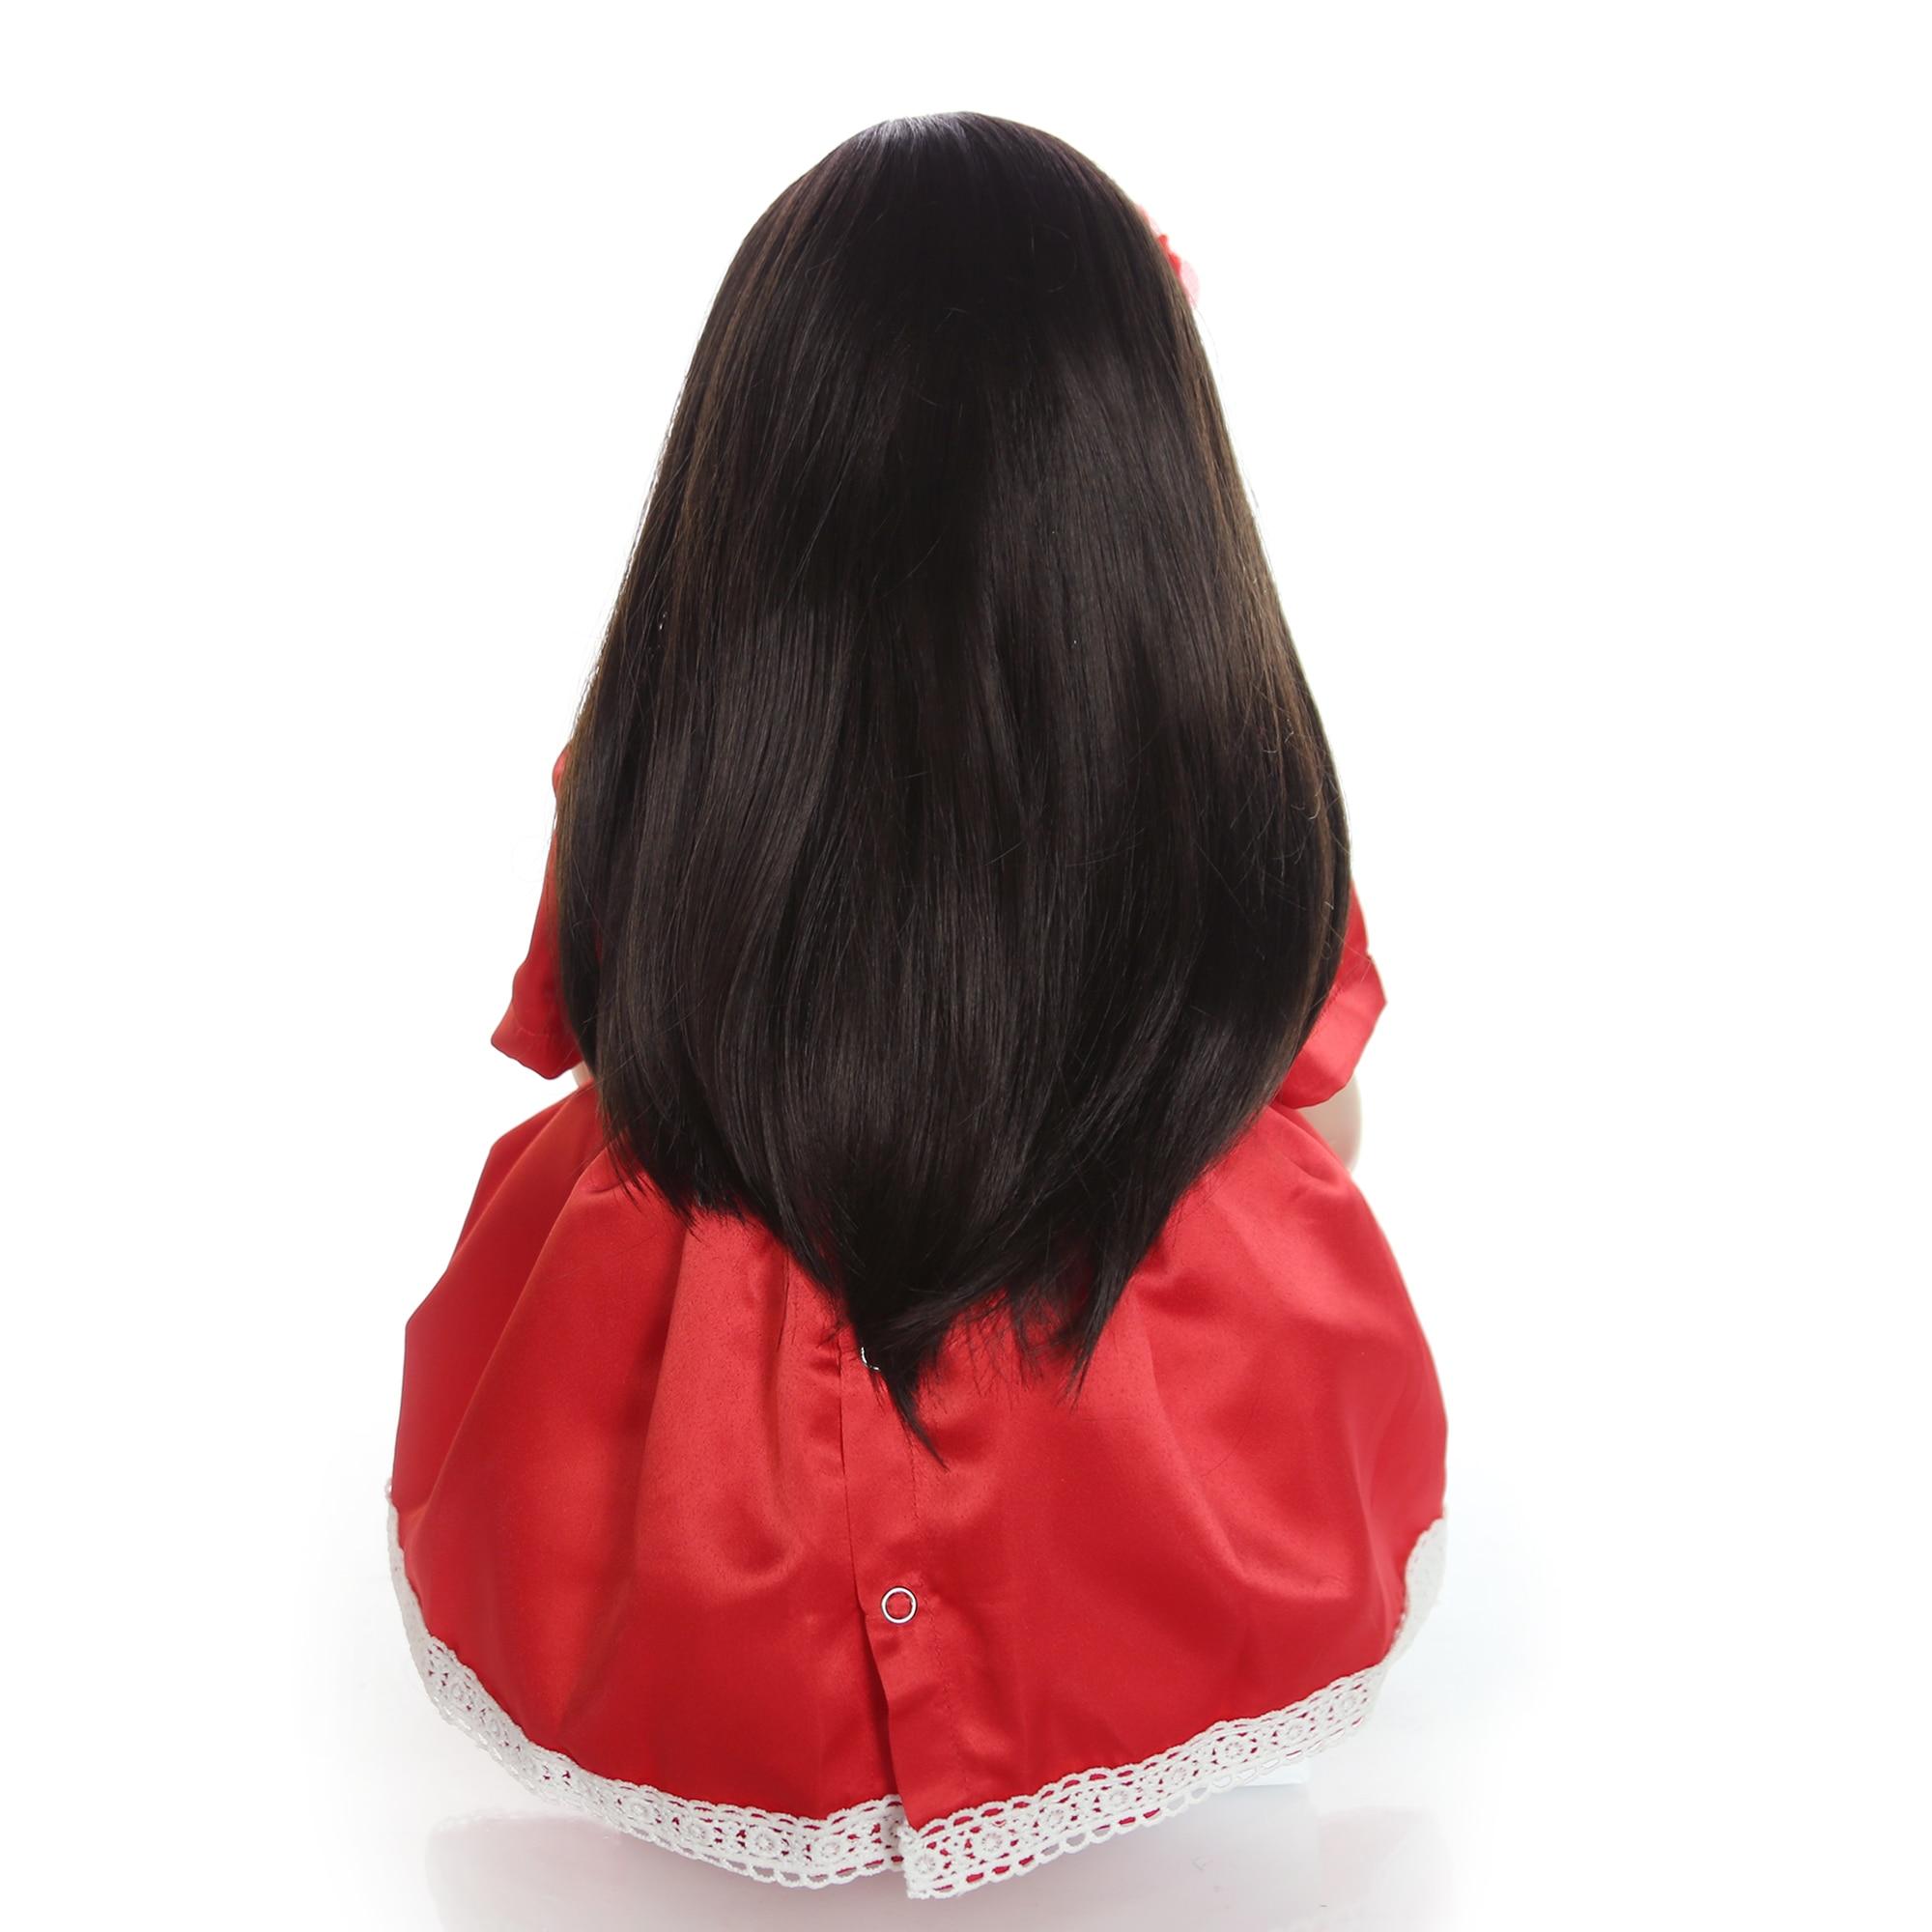 Keiumi 24 inch reborn baby doll toys 60 cm 비닐 공주 유아 아기 인형 소녀 생일 선물 현재 어린이 놀이 집 장난감-에서인형부터 완구 & 취미 의  그룹 2